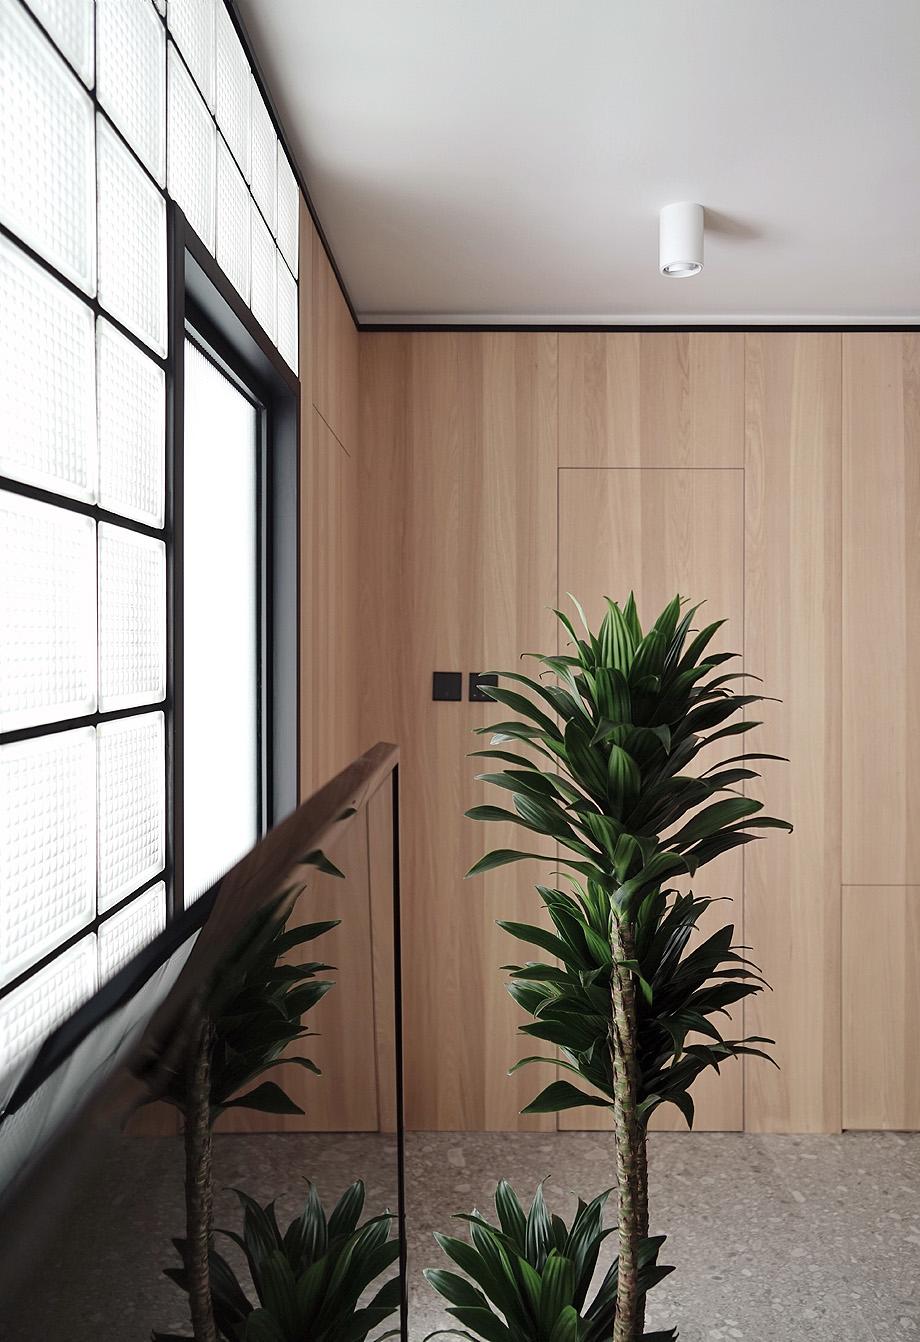 apartmento srk de human w design - foto human w design (14)